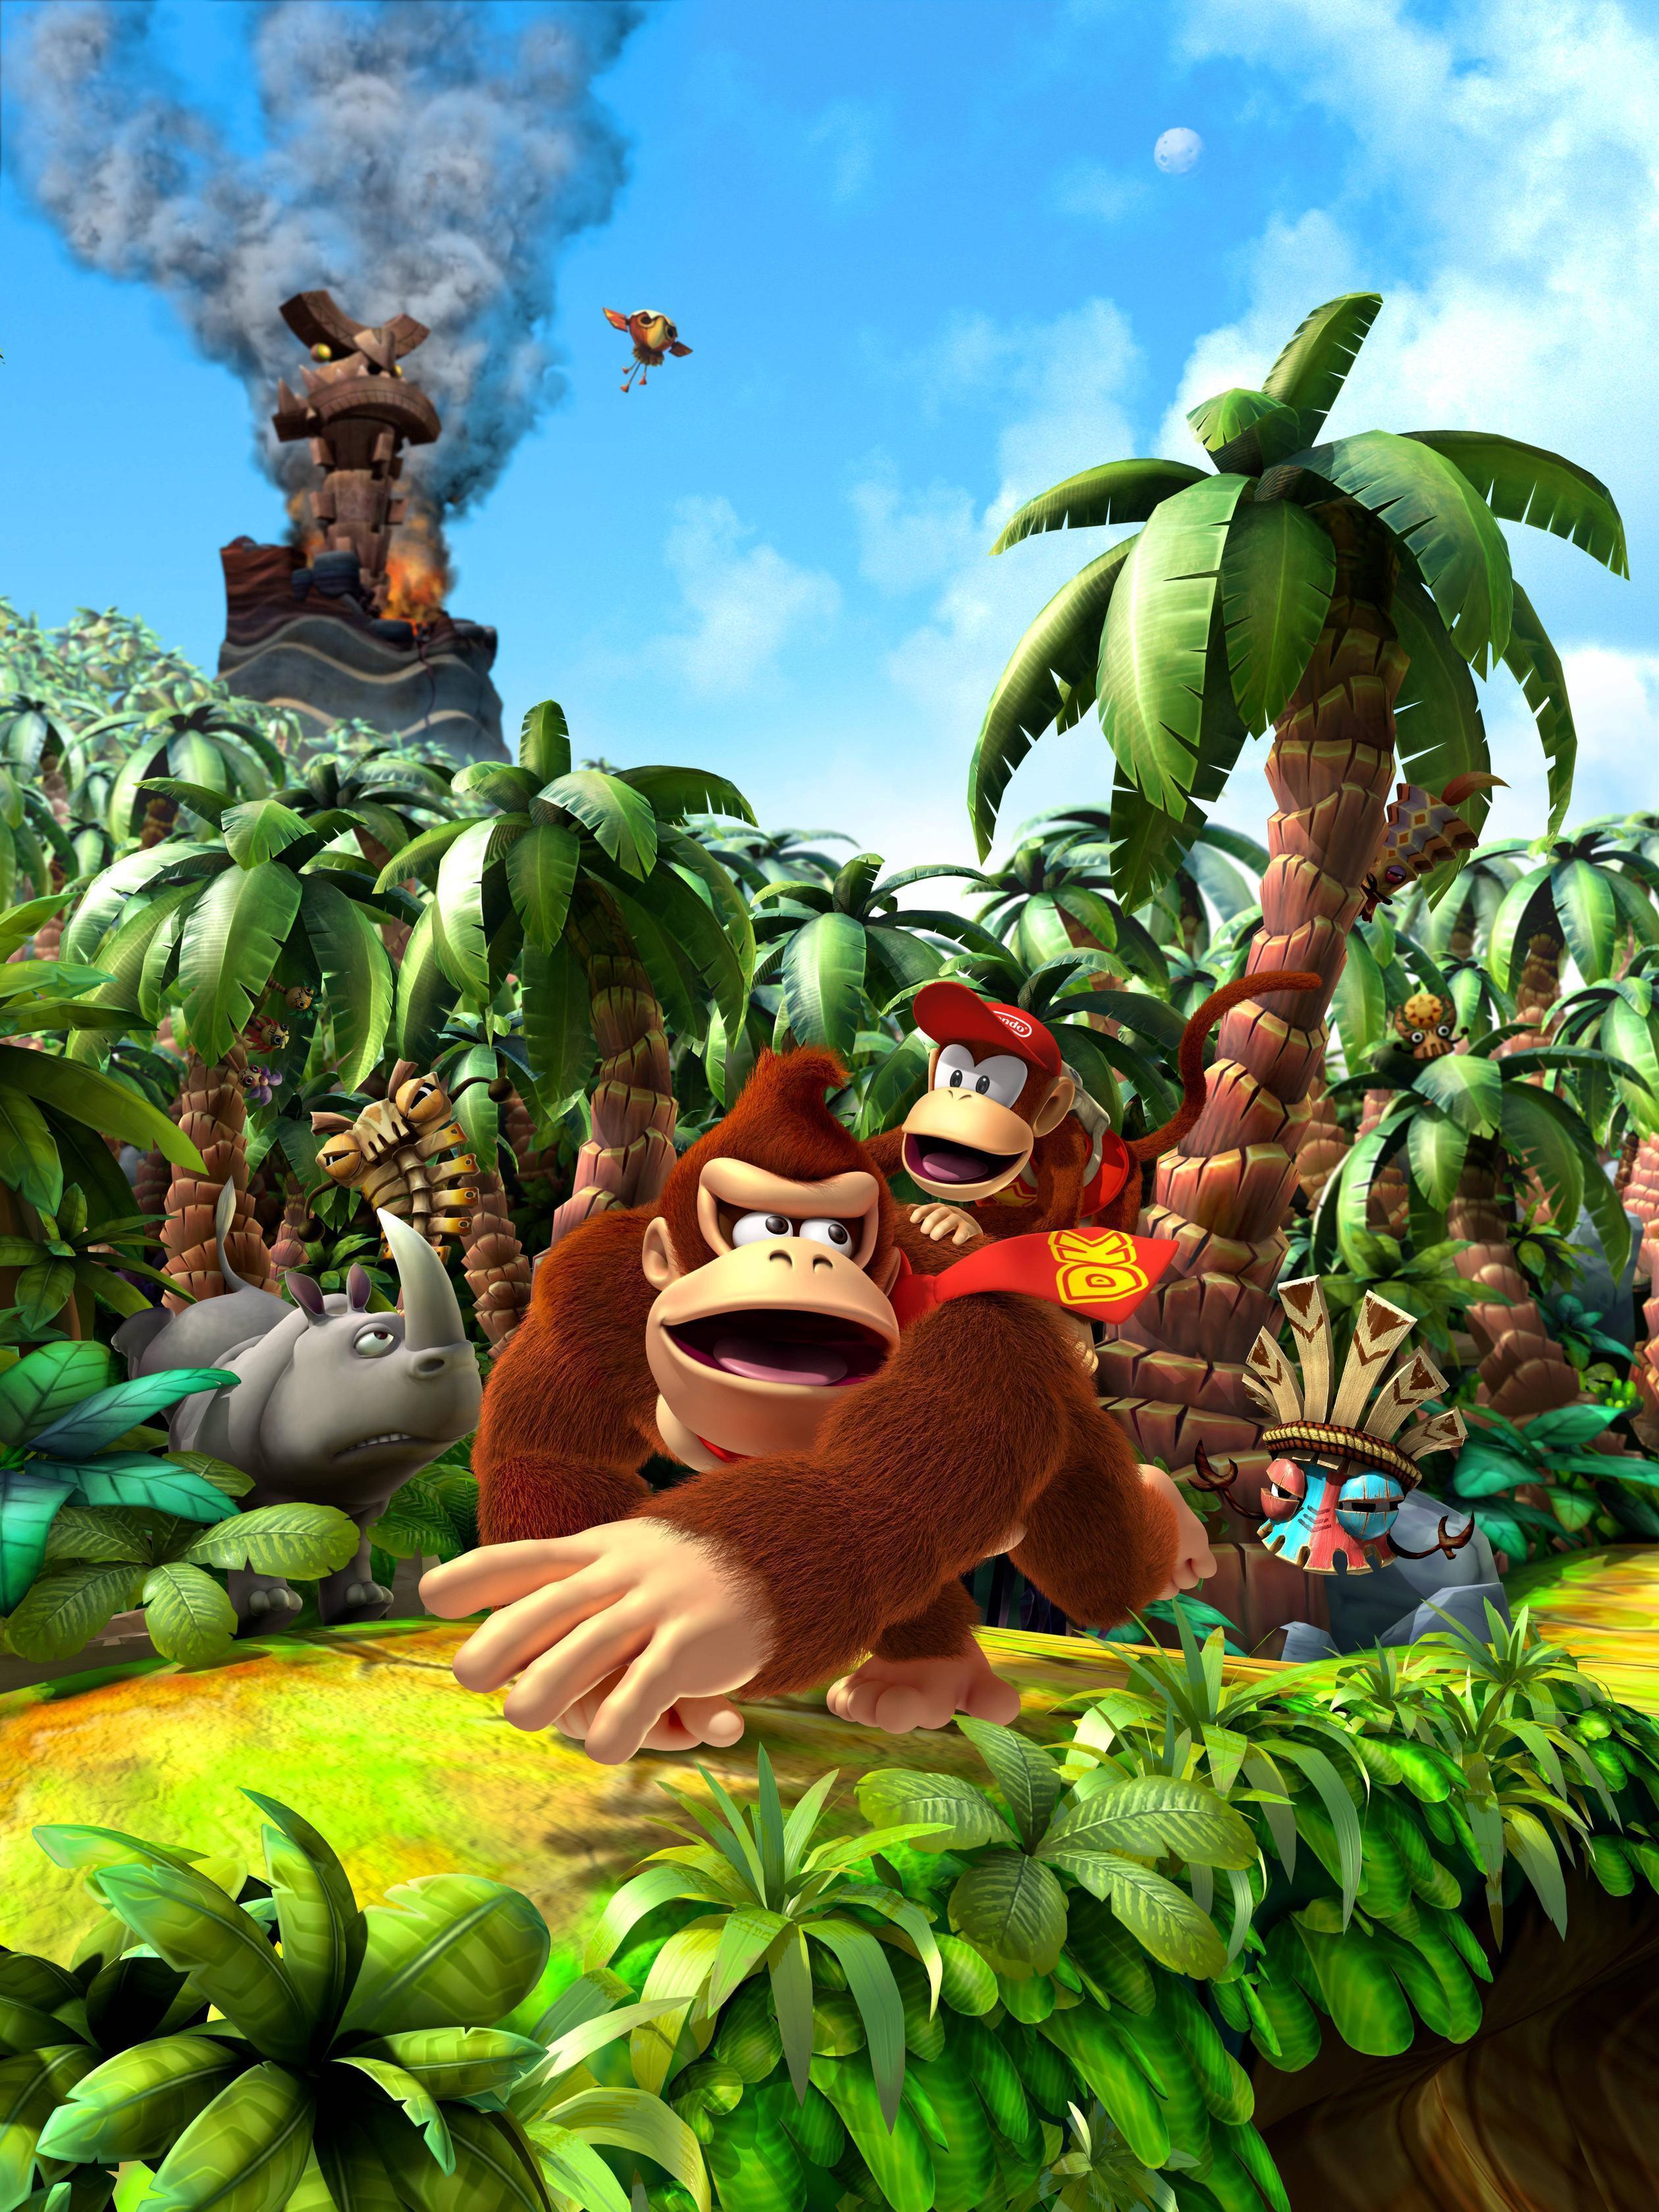 Super Mario 3d World Wallpaper Donkey Kong Country Returns Wallpapers Wallpaper Cave